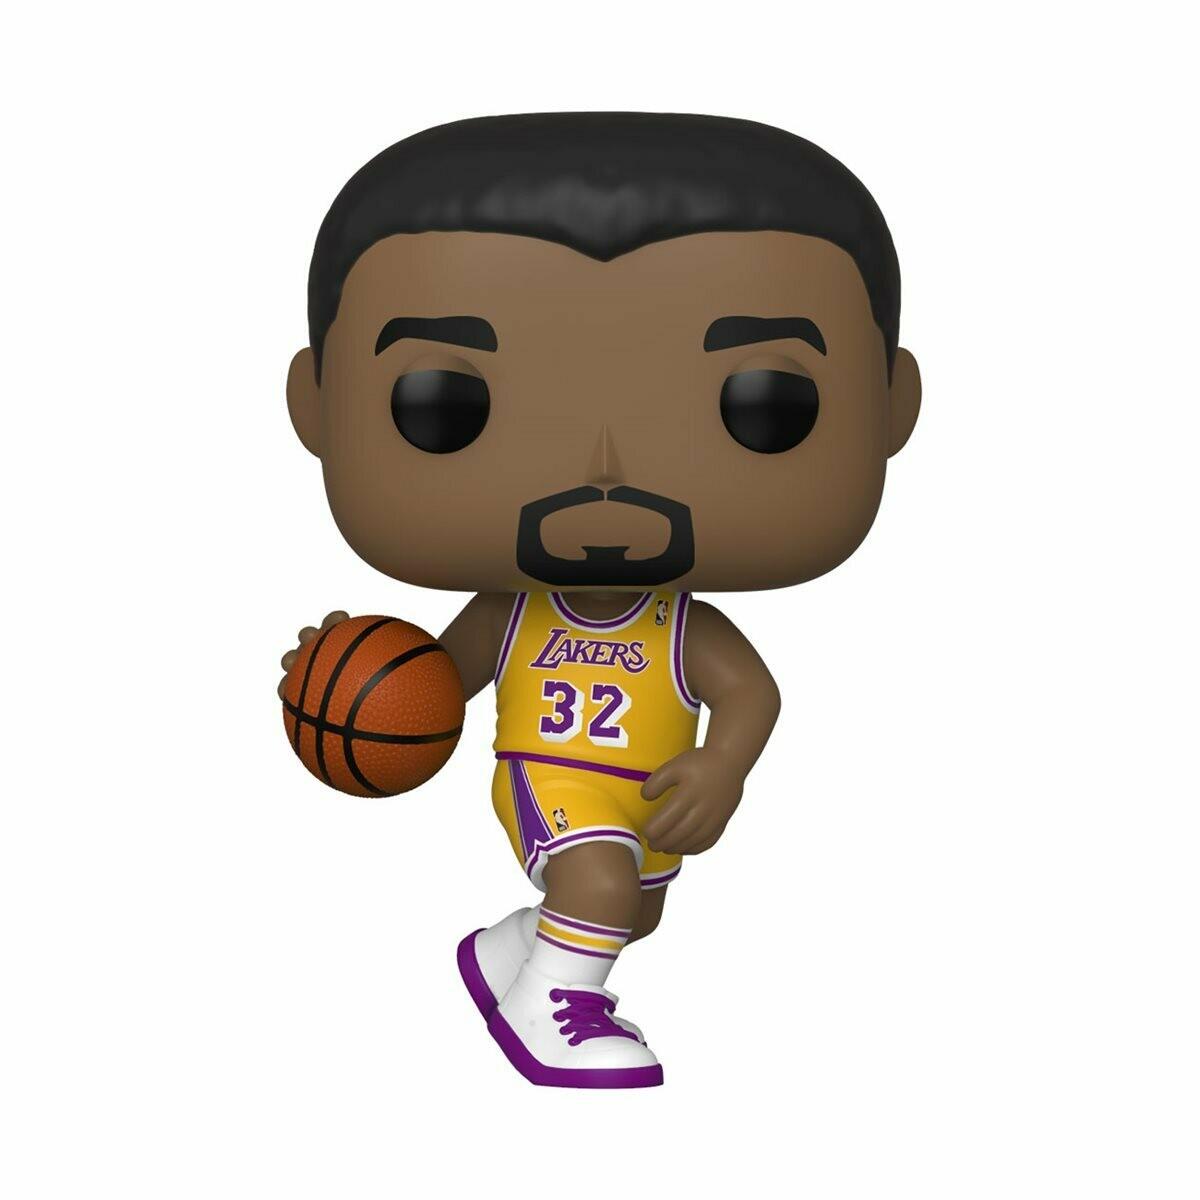 Funko NBA Legends Magic Johnson (Lakers home) Pop! Vinyl Figure